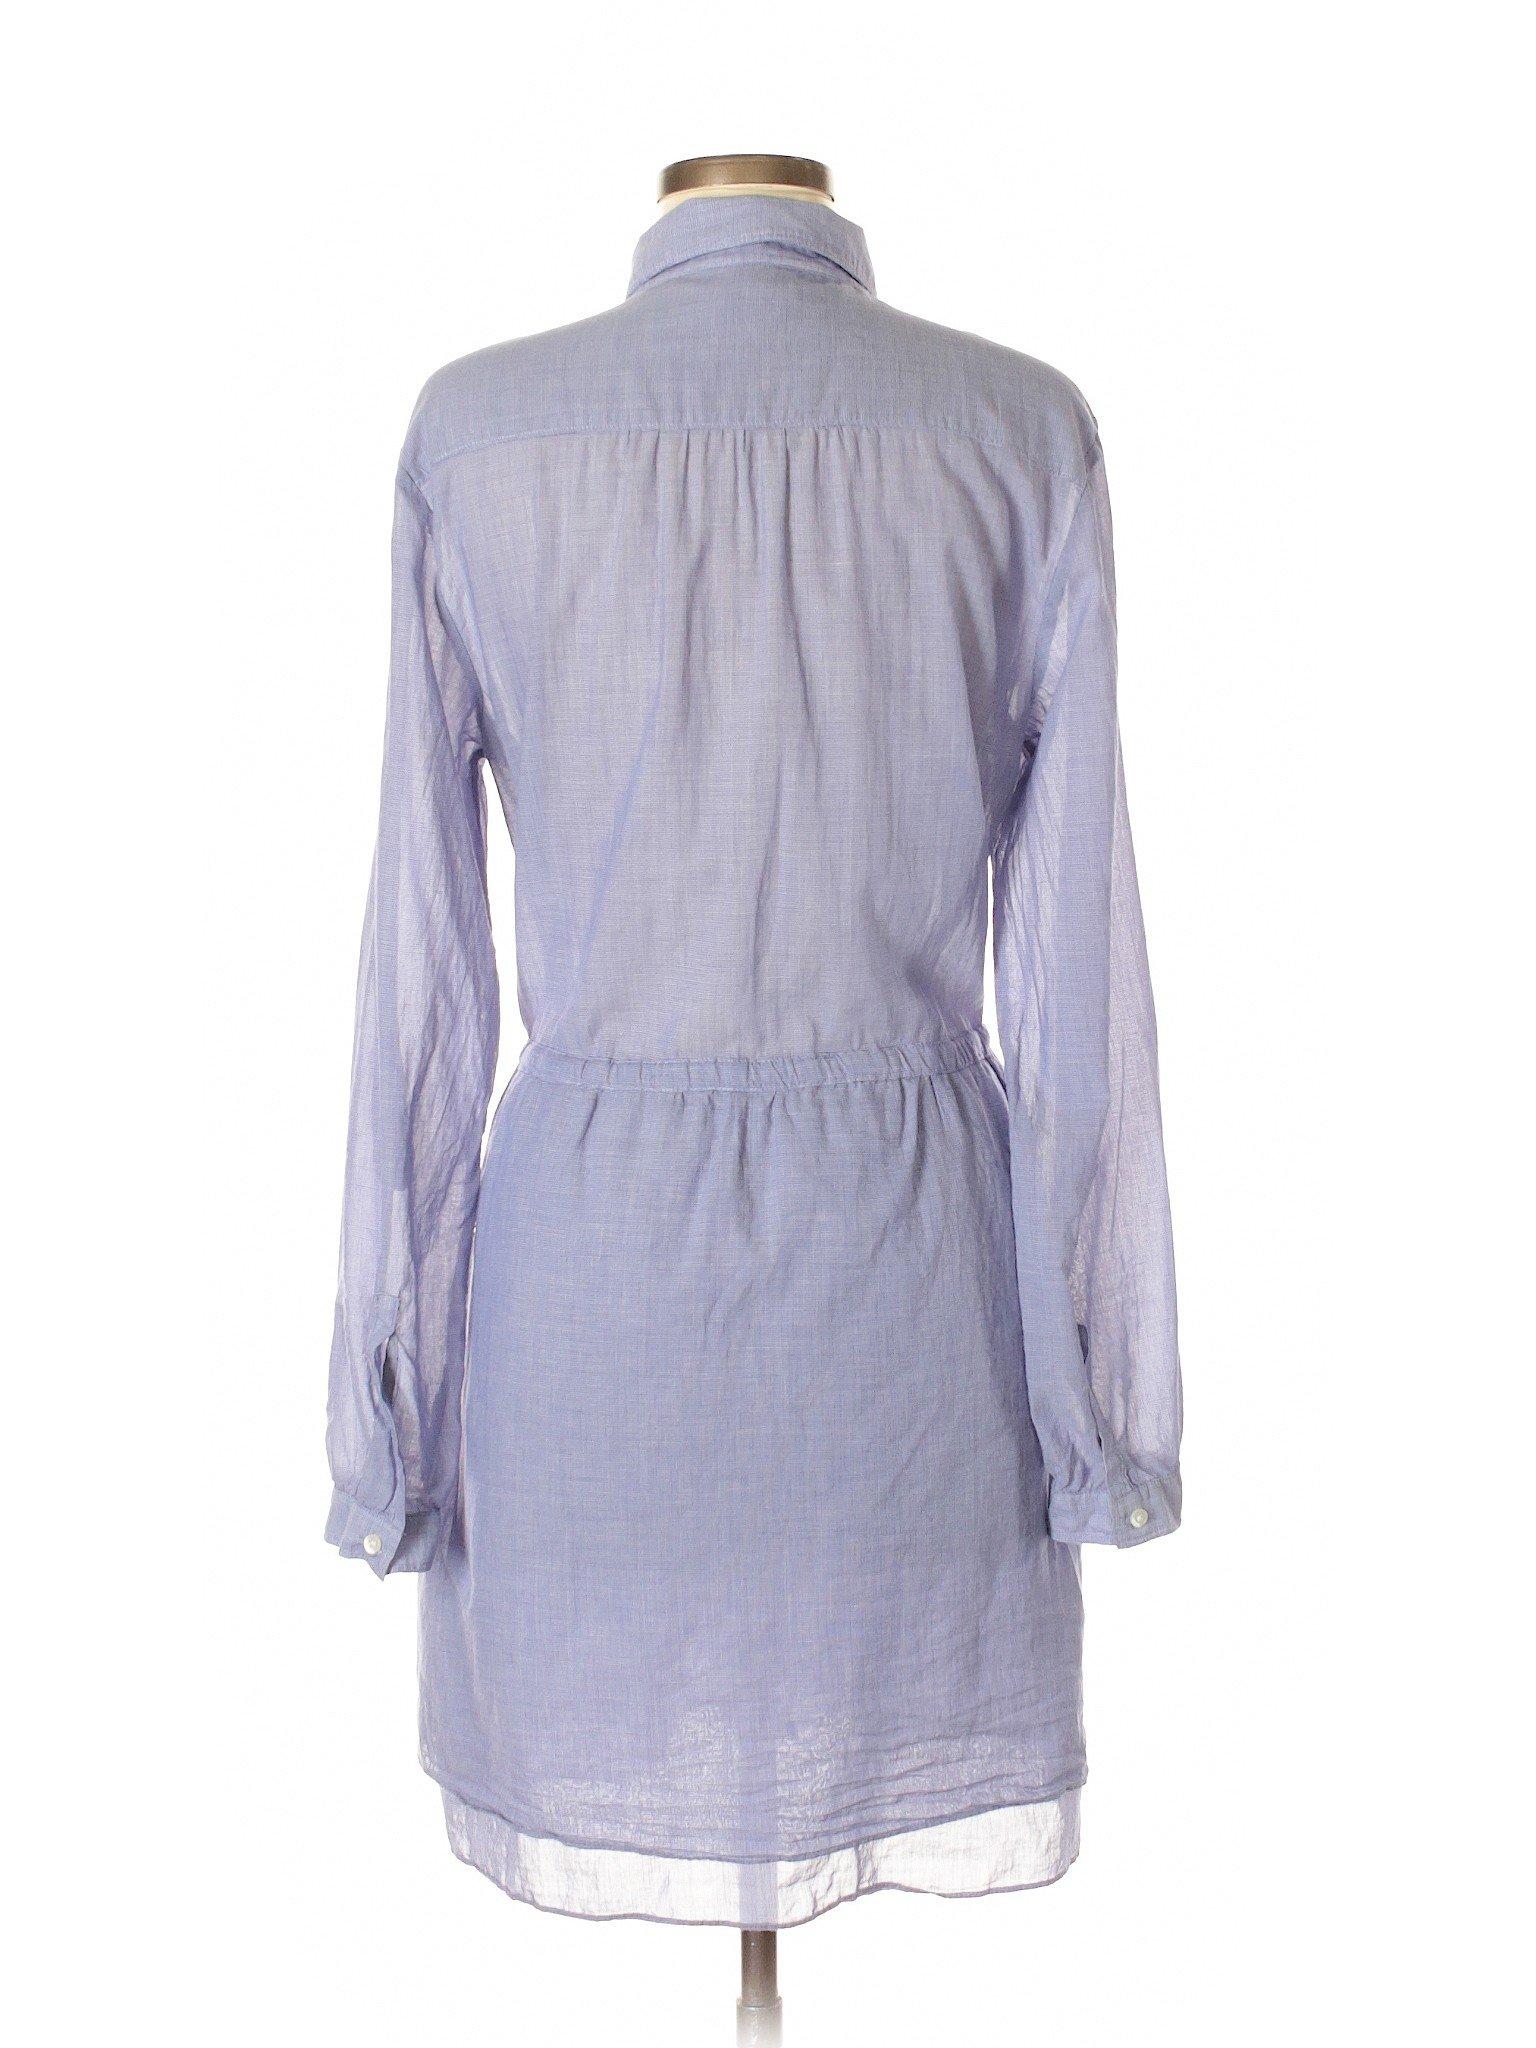 winter Boutique winter Gap Casual Casual Gap Boutique Dress Dress BrfrXwq